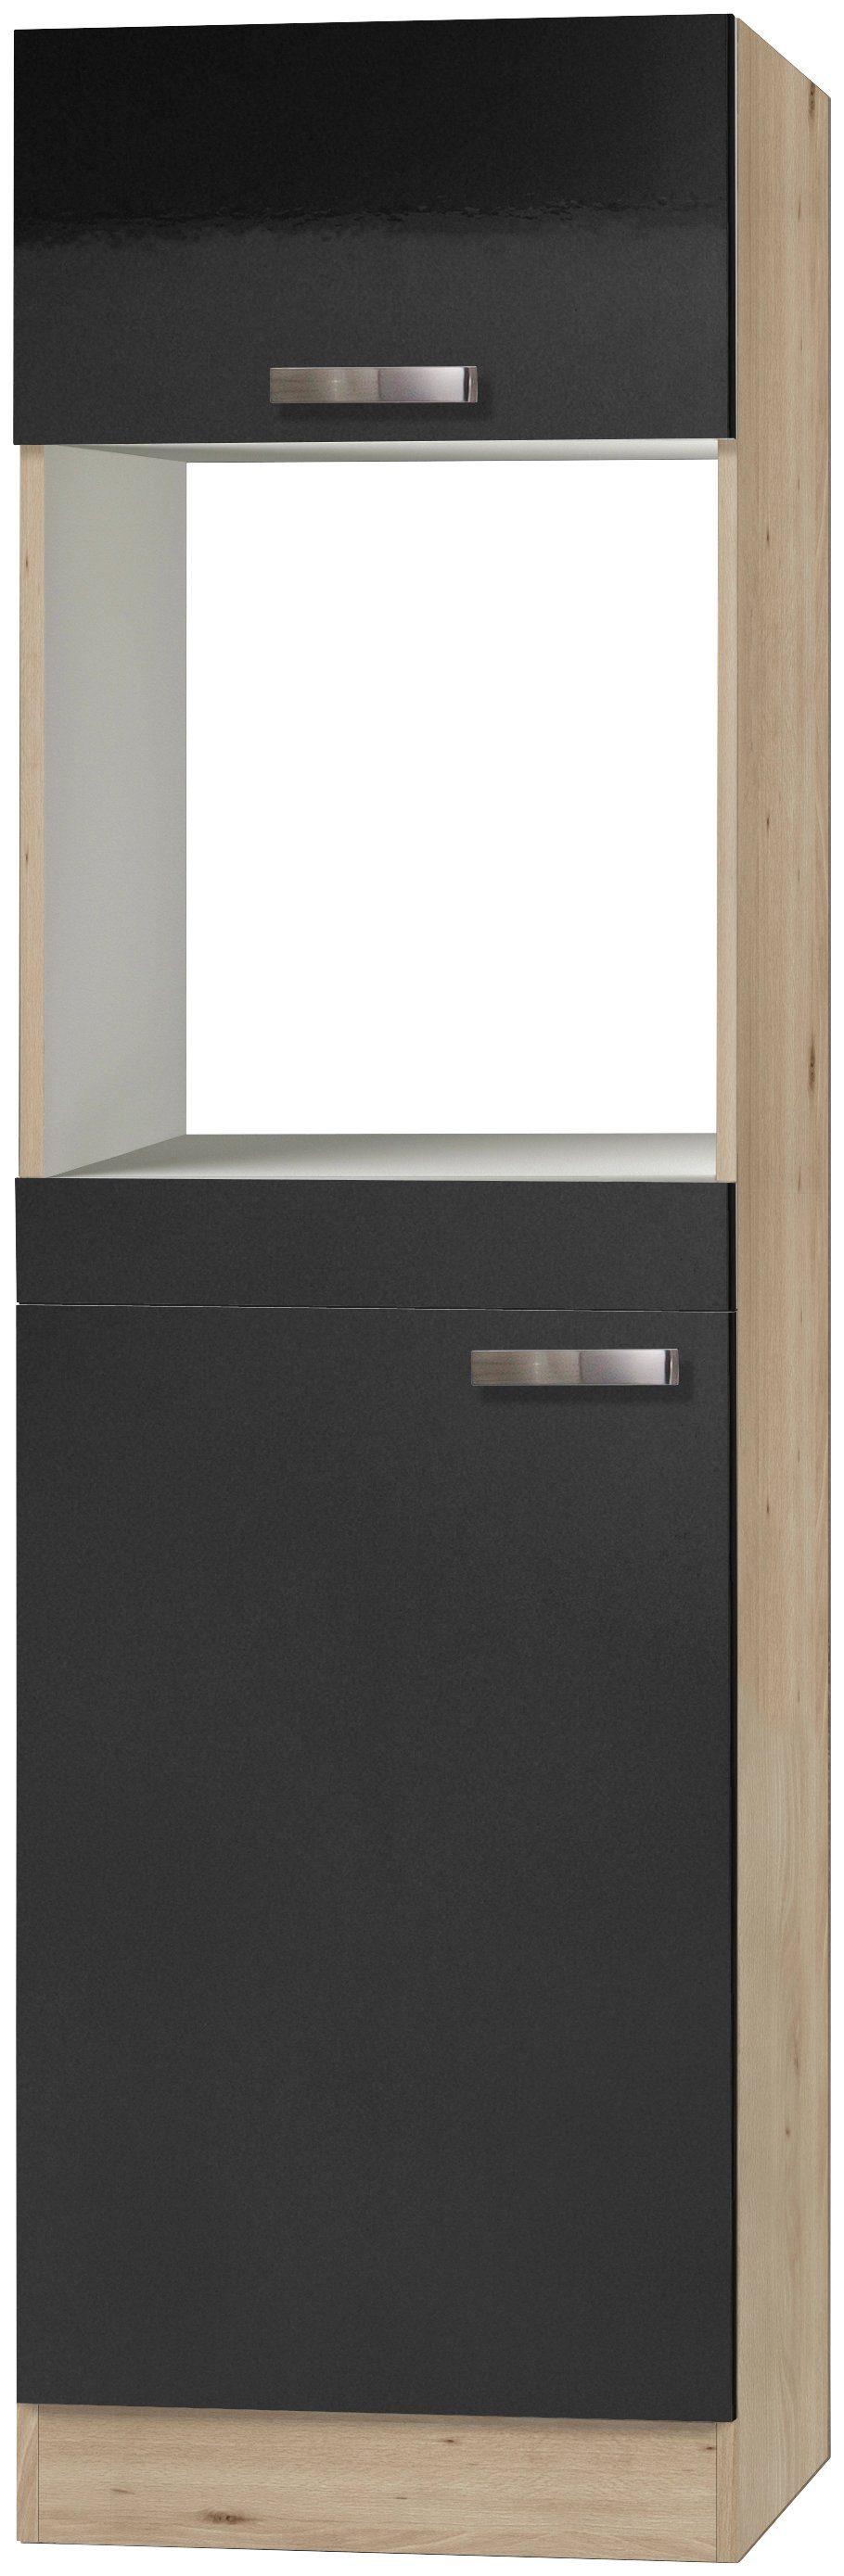 OPTIFIT Kombinierter Backofen-Kühlumbauschrank »OPTIkult Udine«, Breite 60 cm